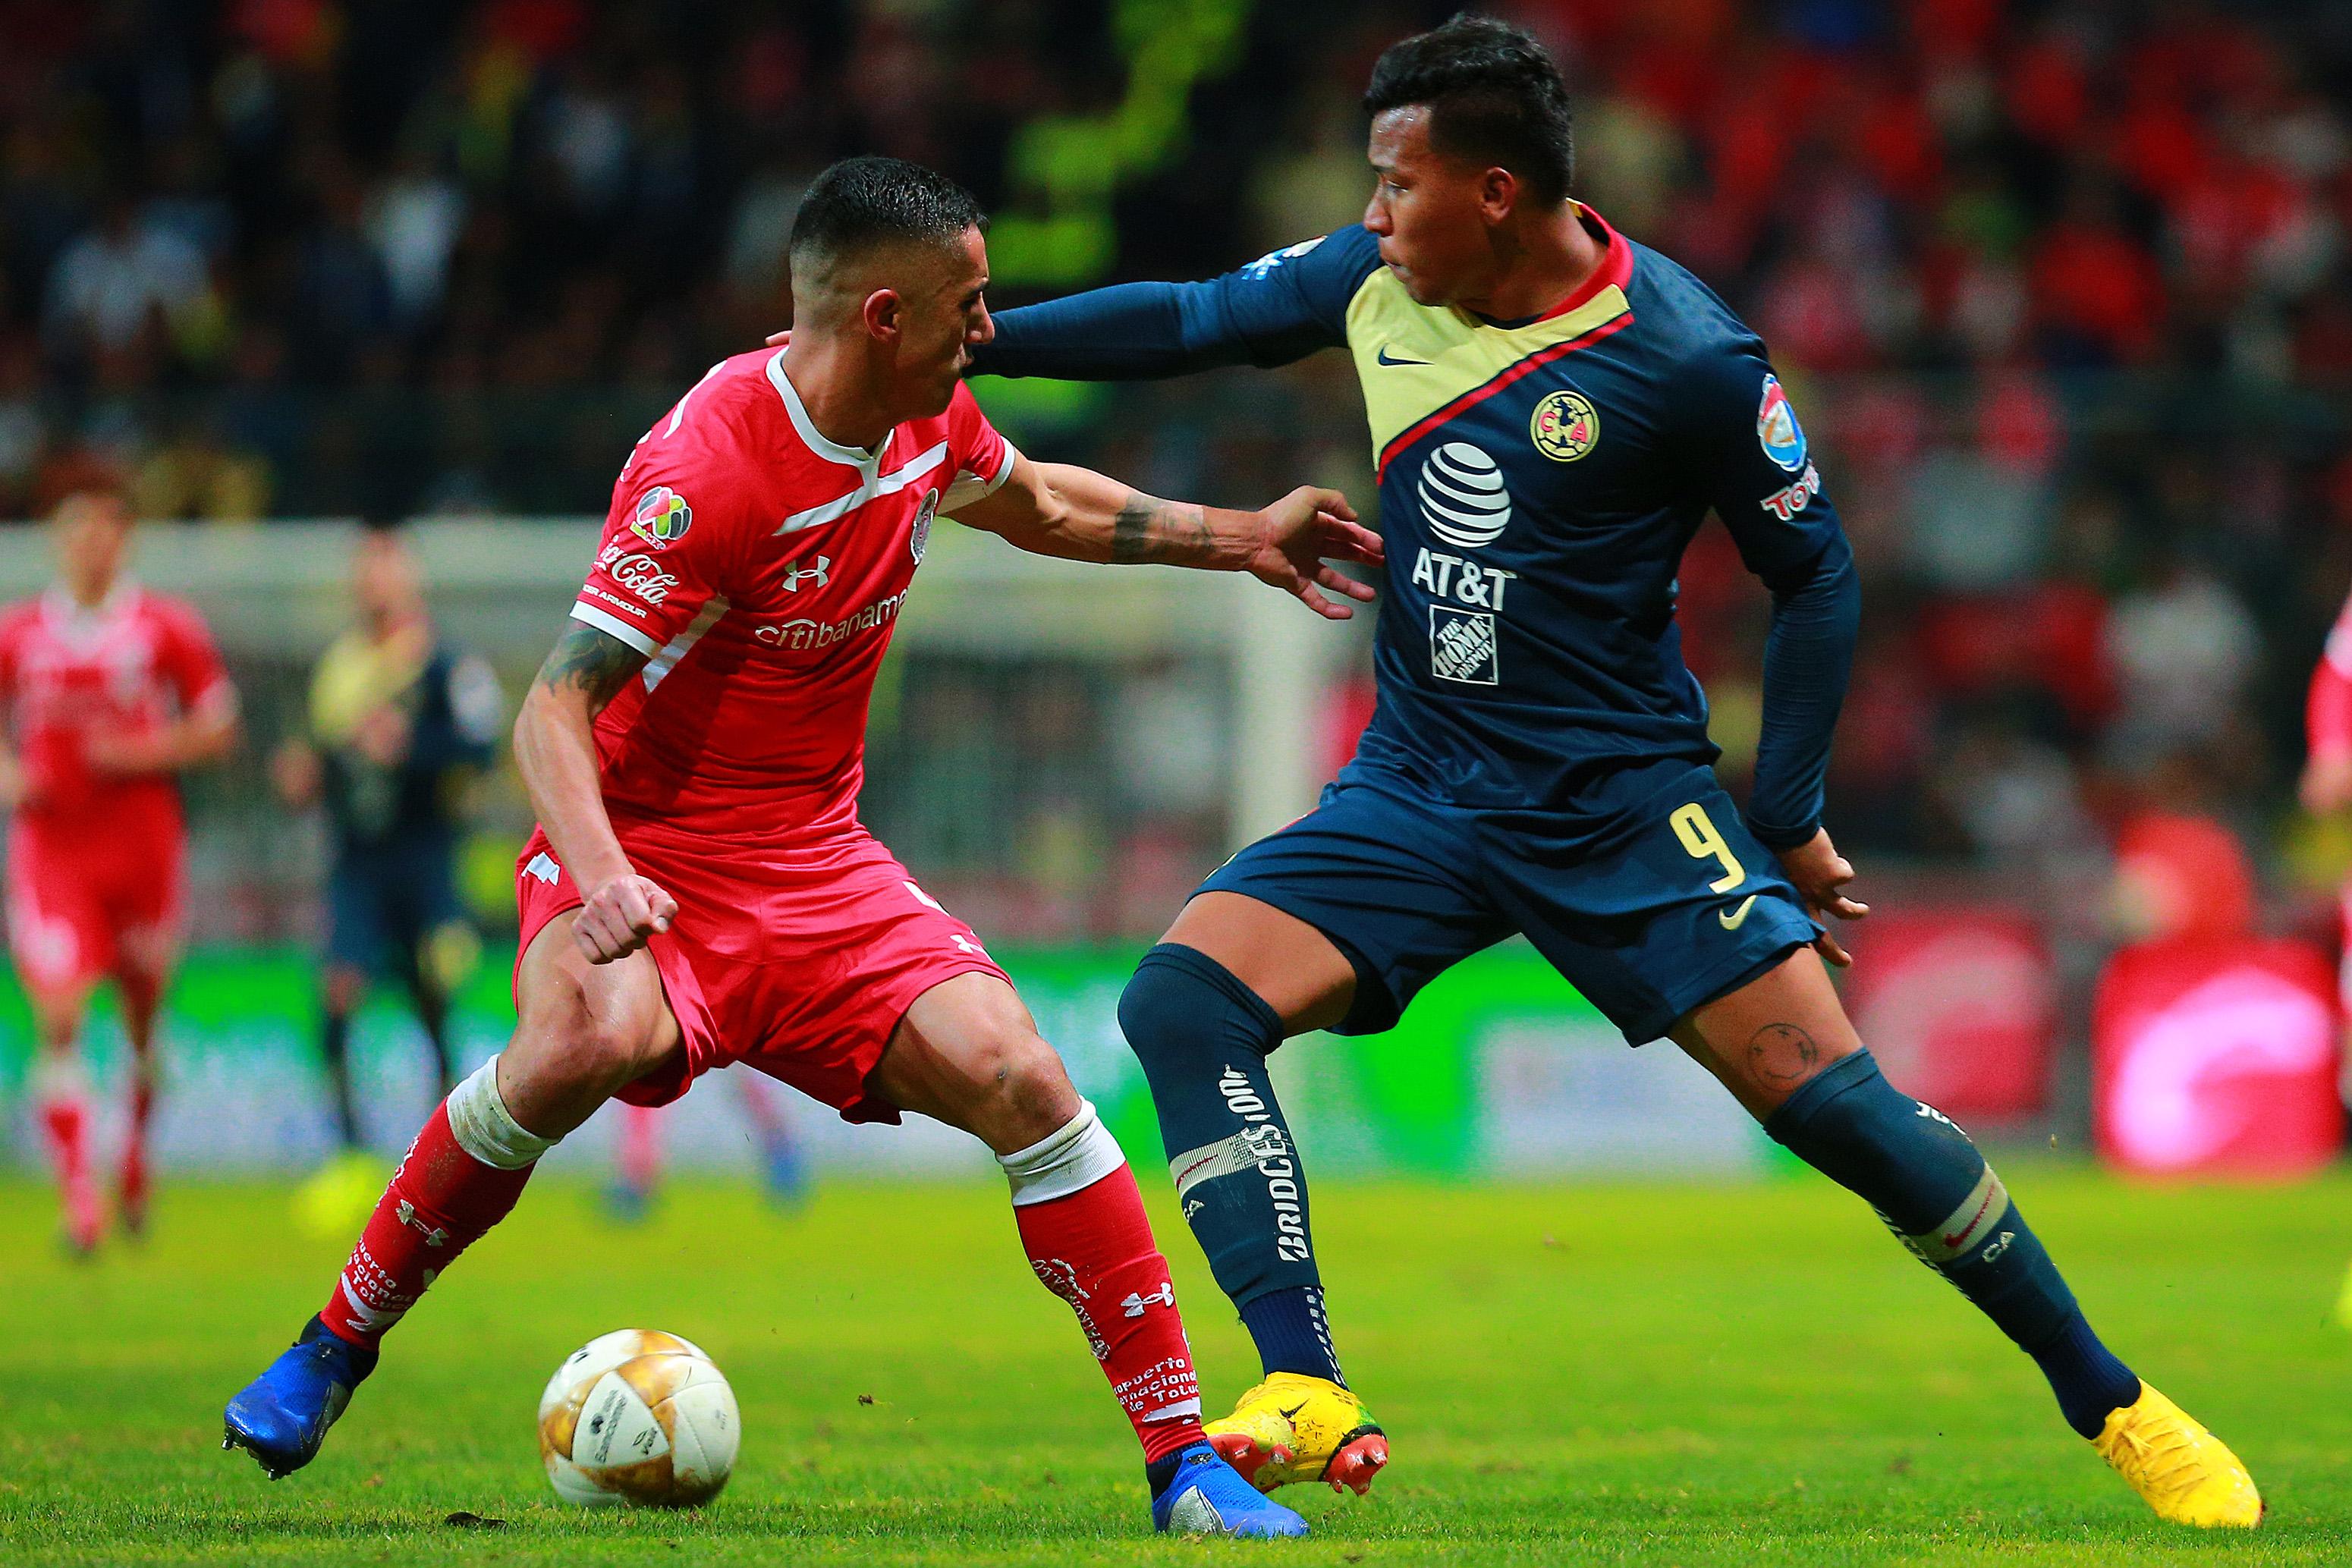 América, Toluca, Liguilla, Apertura 2018 Los Pleyers